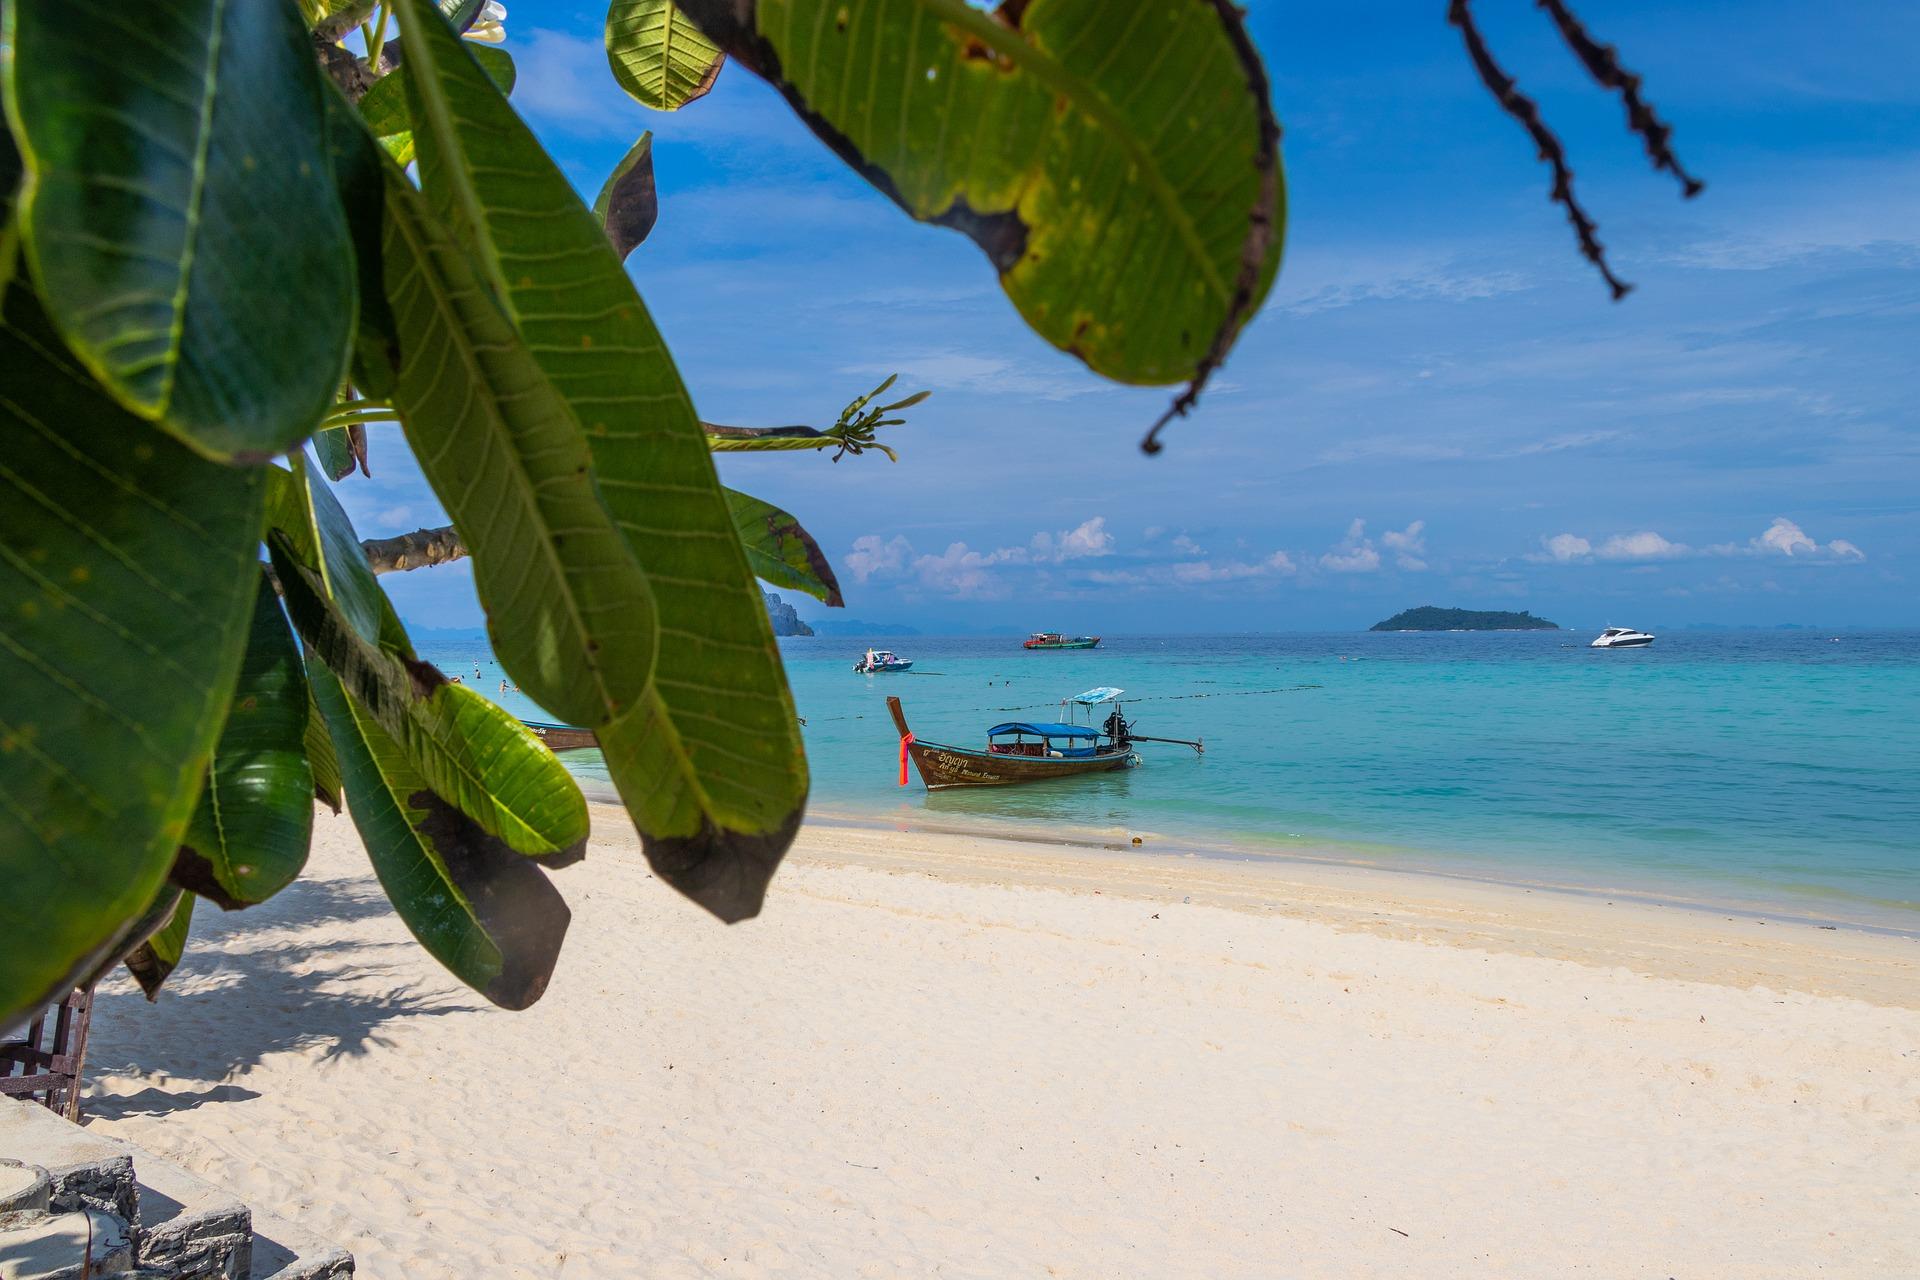 Klong Muang Beach 14 Tage Flug Hotel schon günstig ab 569,00€